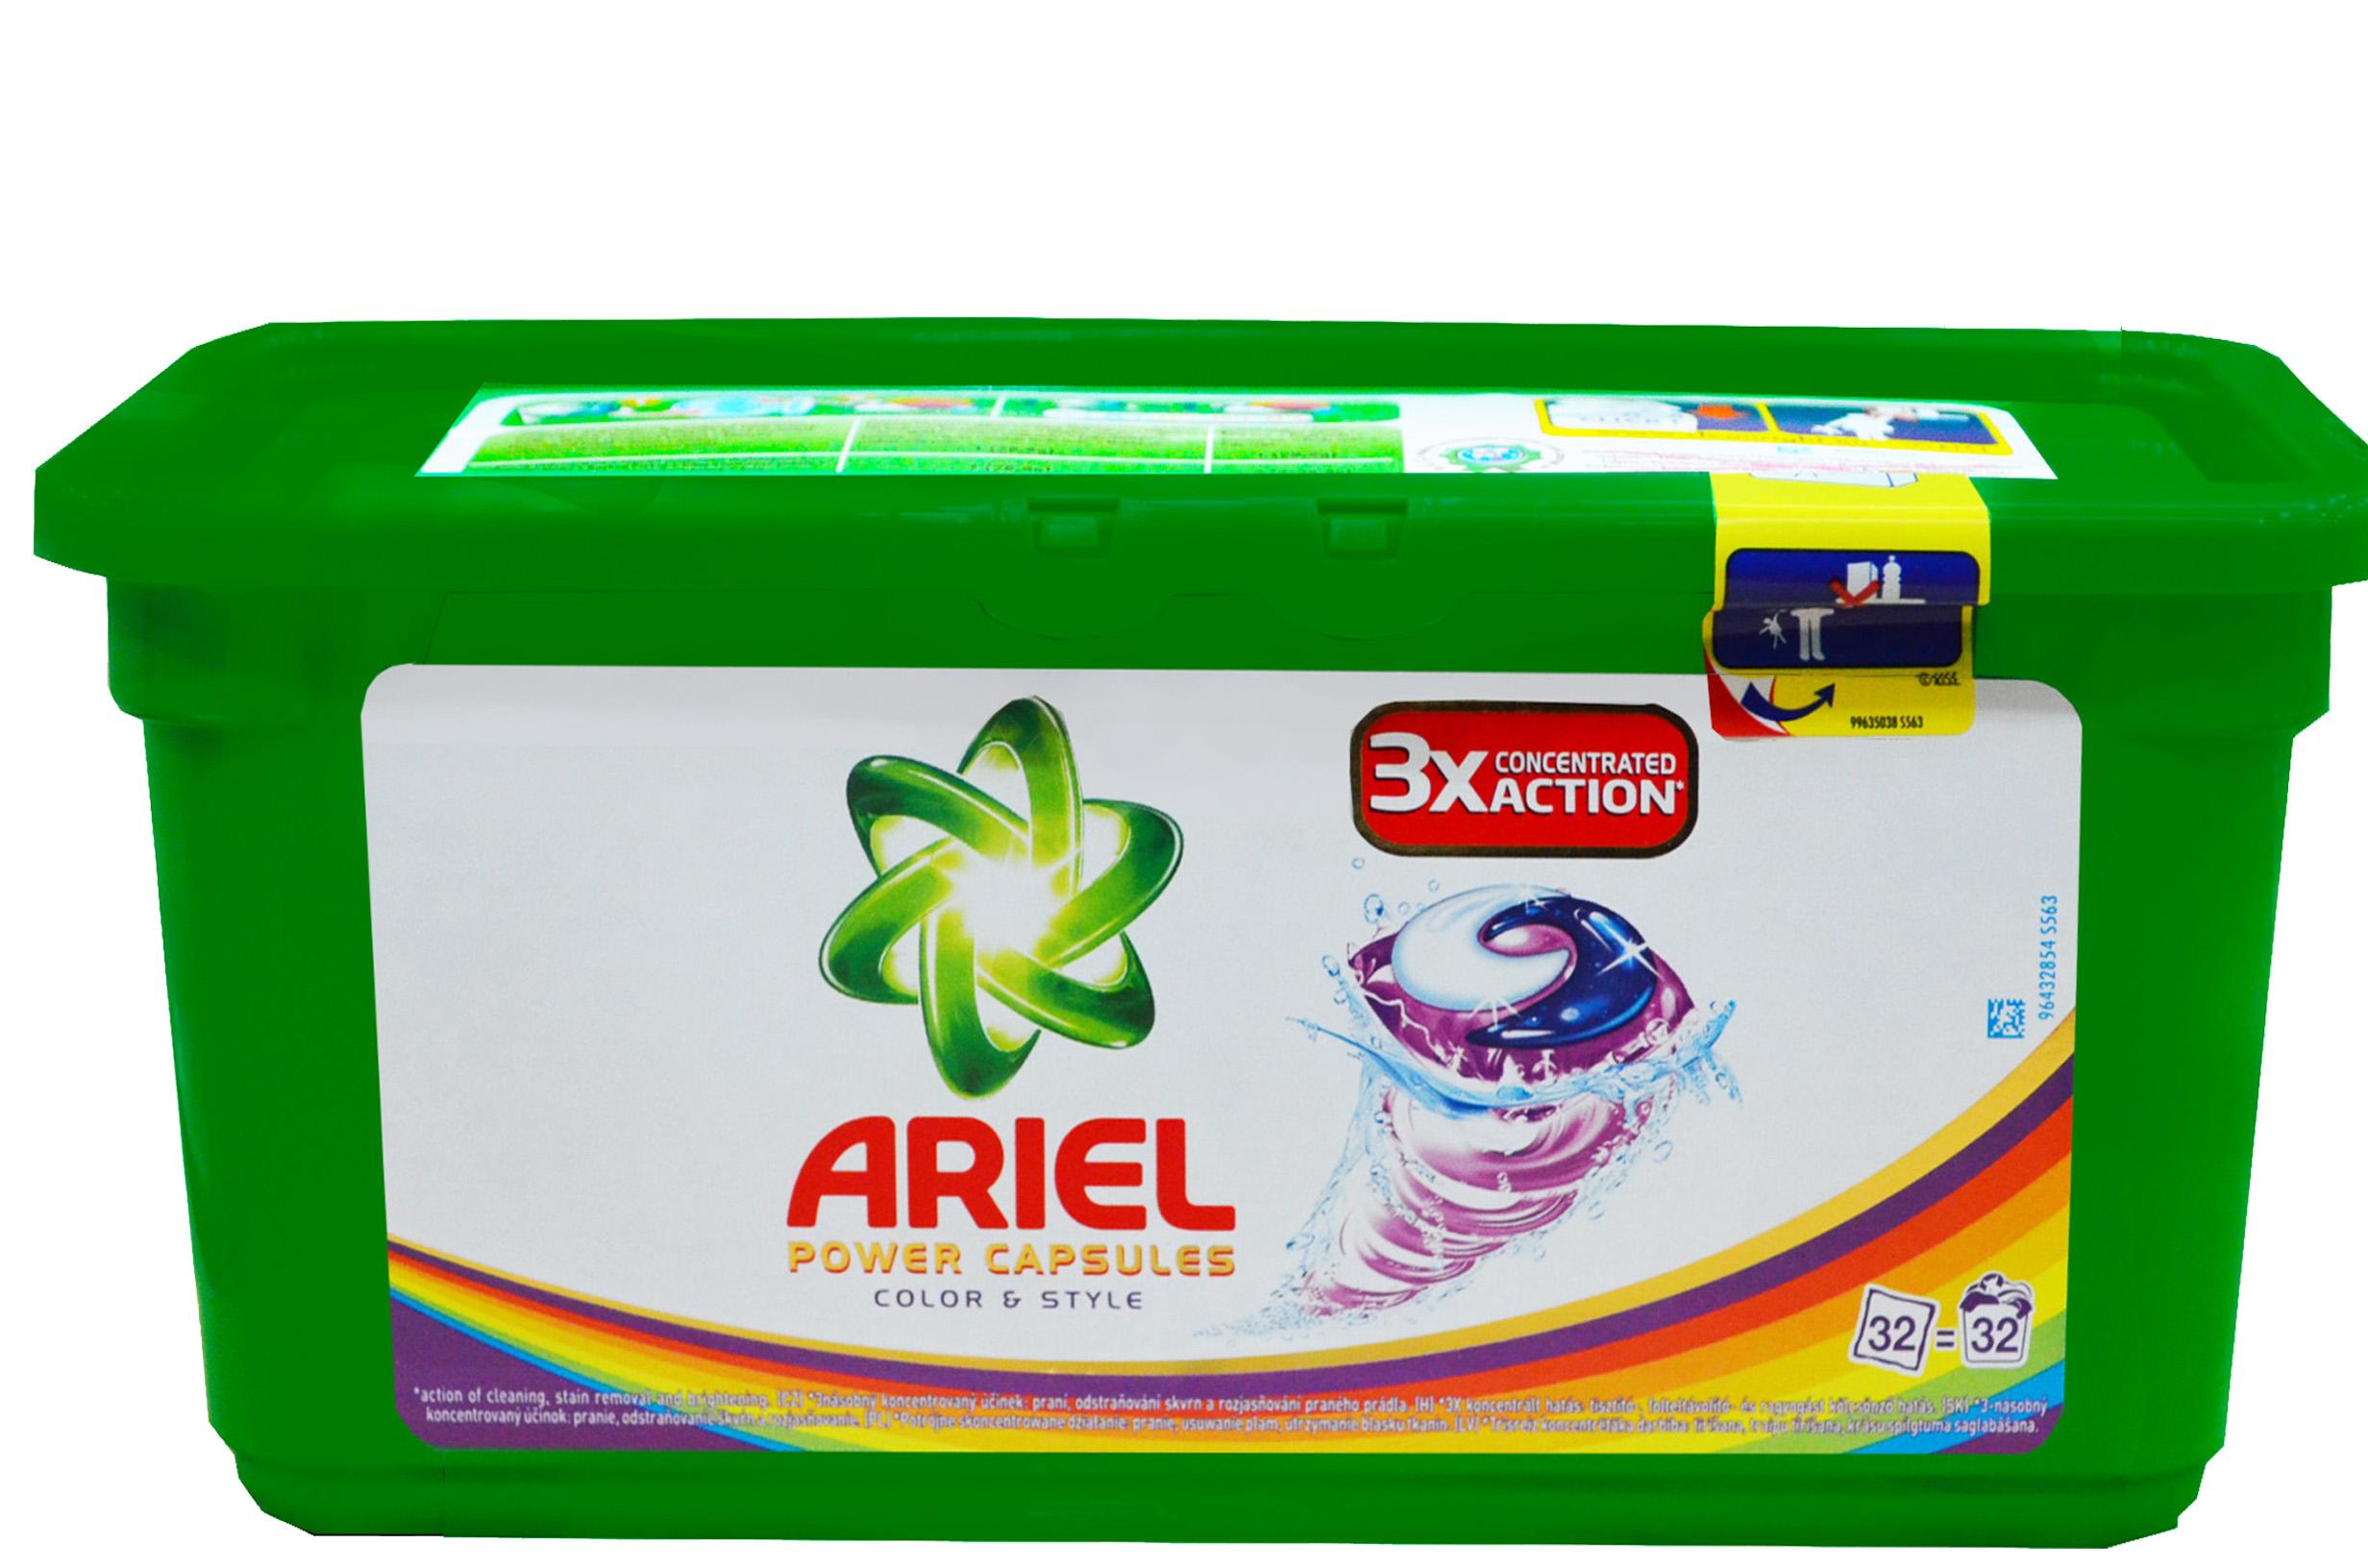 Ariel Actilift, tabletki piorące, 21 szt. Image